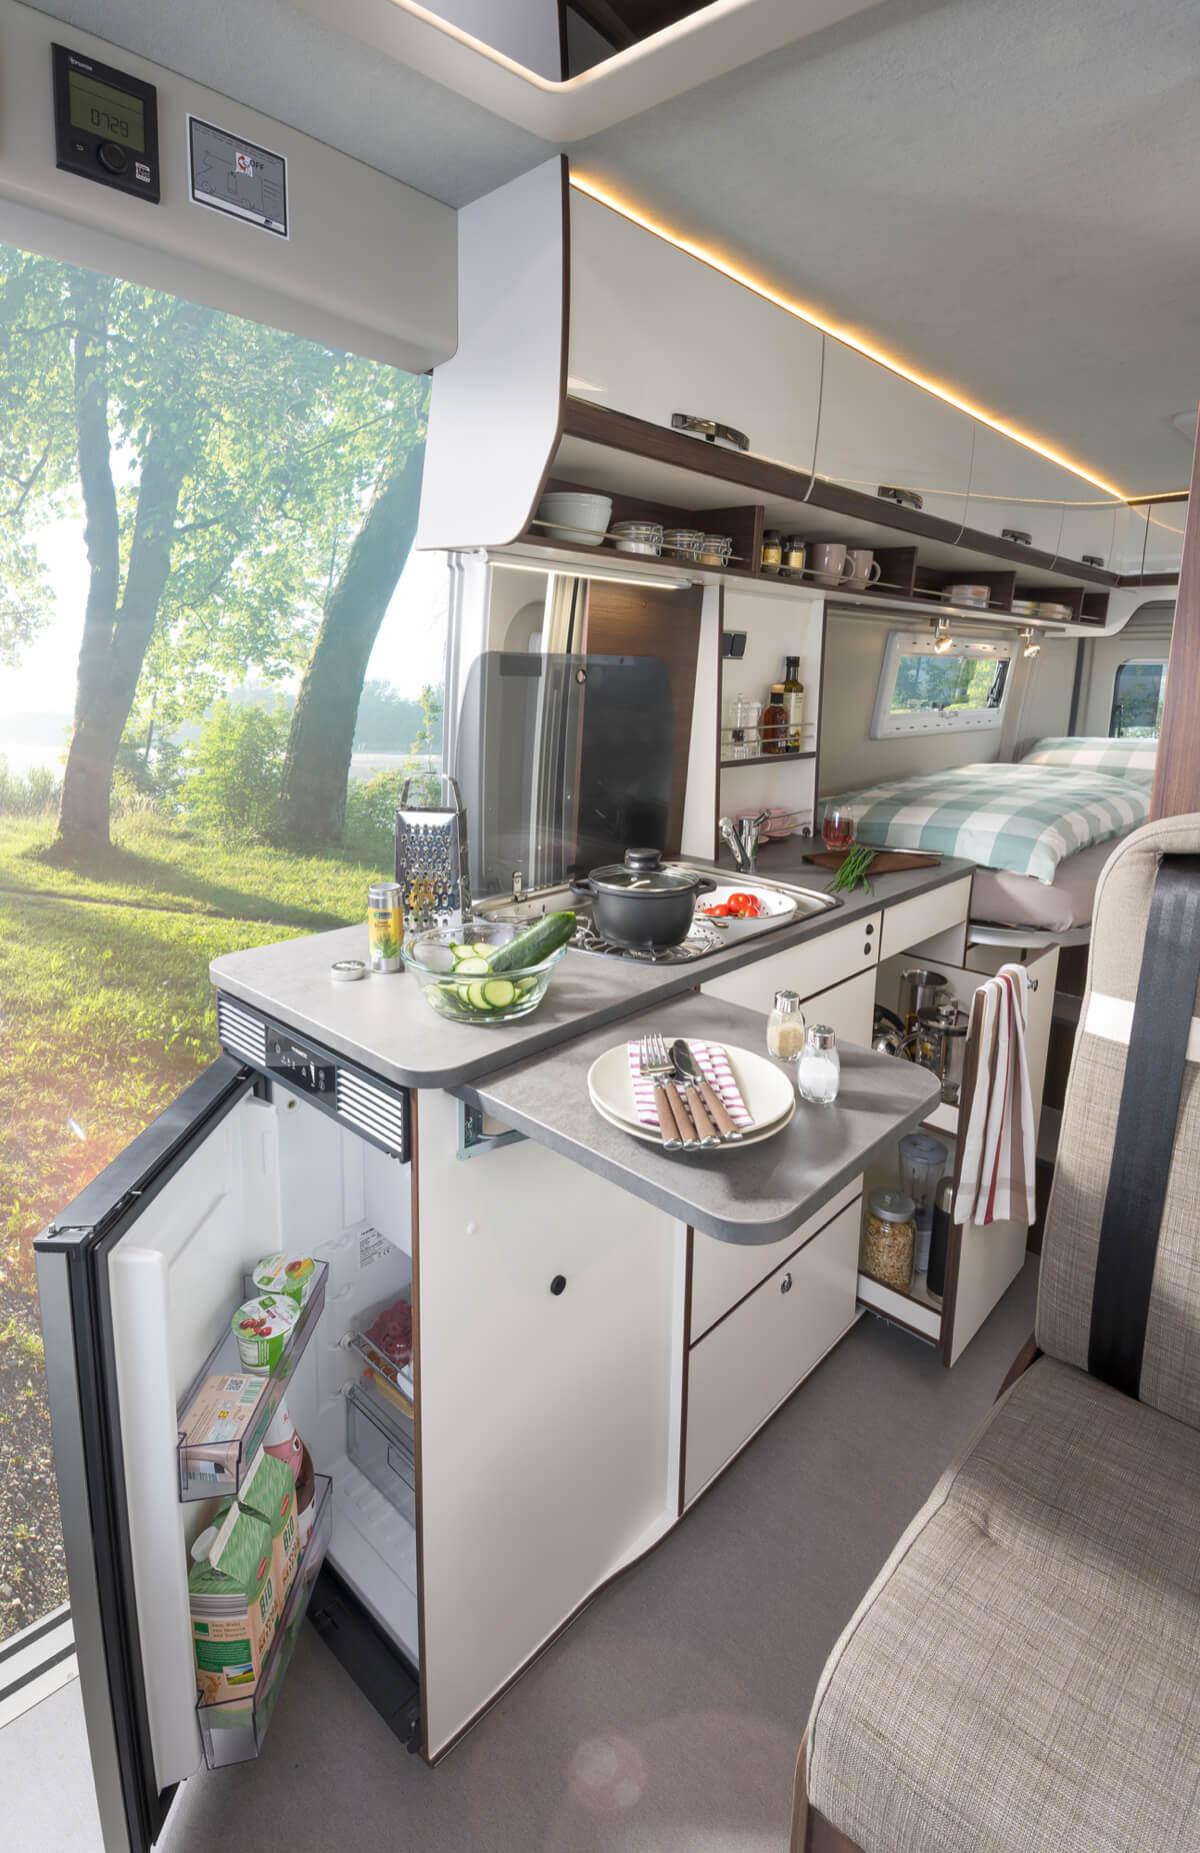 Possl Summit 640 Prime - Cocina